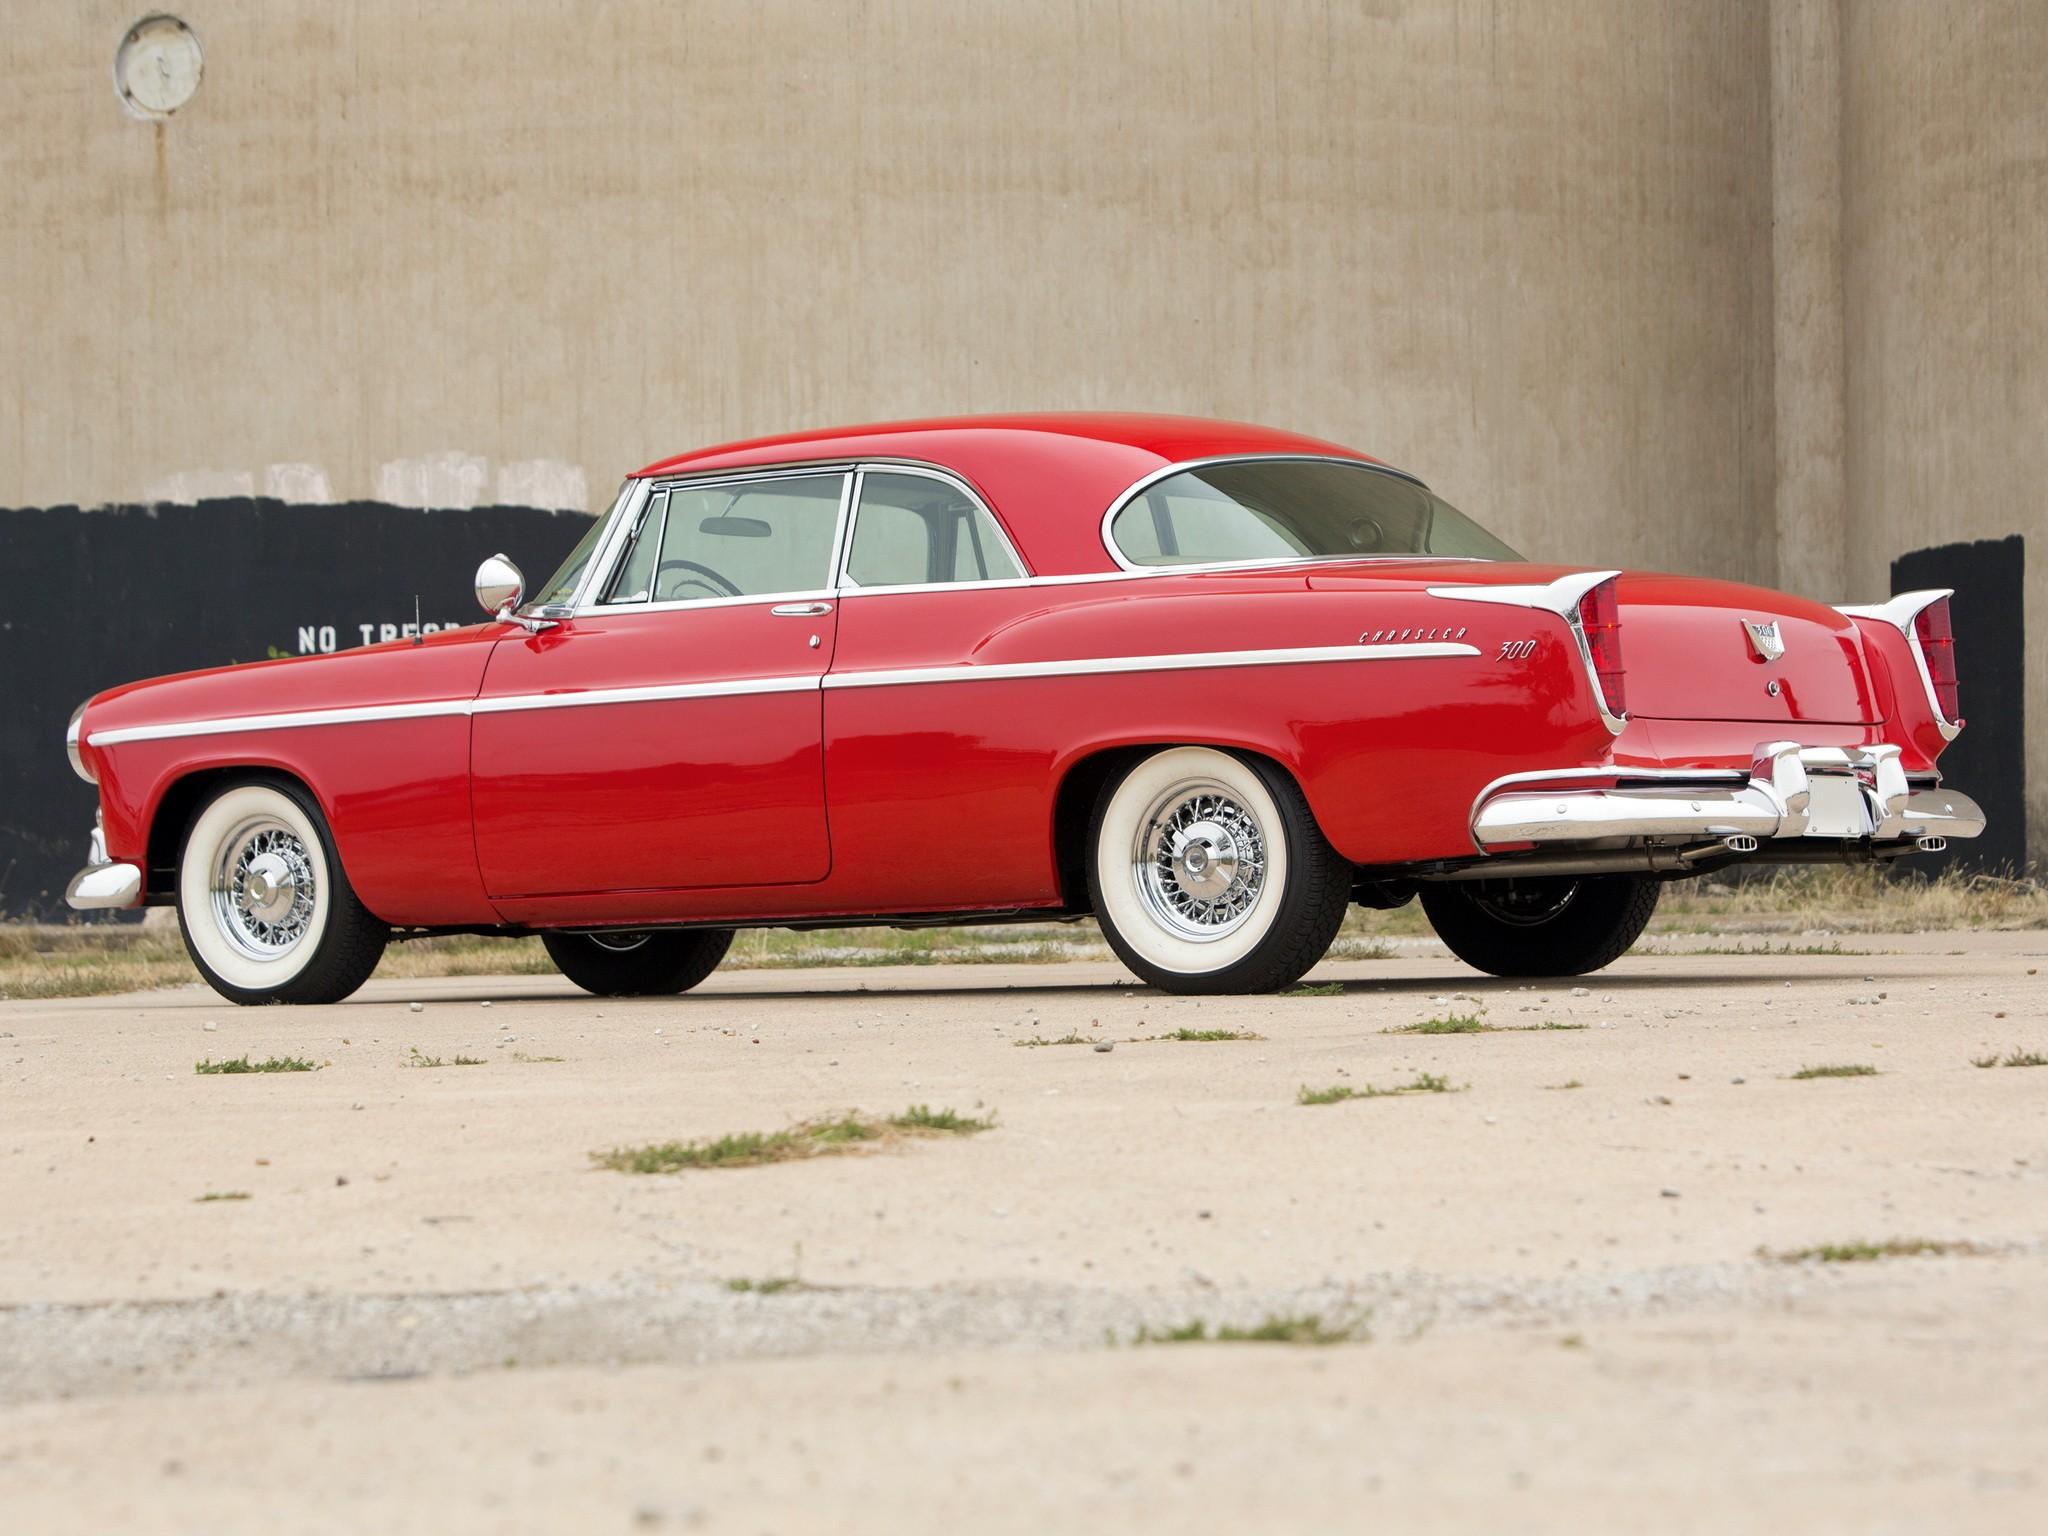 sale phoenix cars classic chrysler near american coupe arizona car for on classics